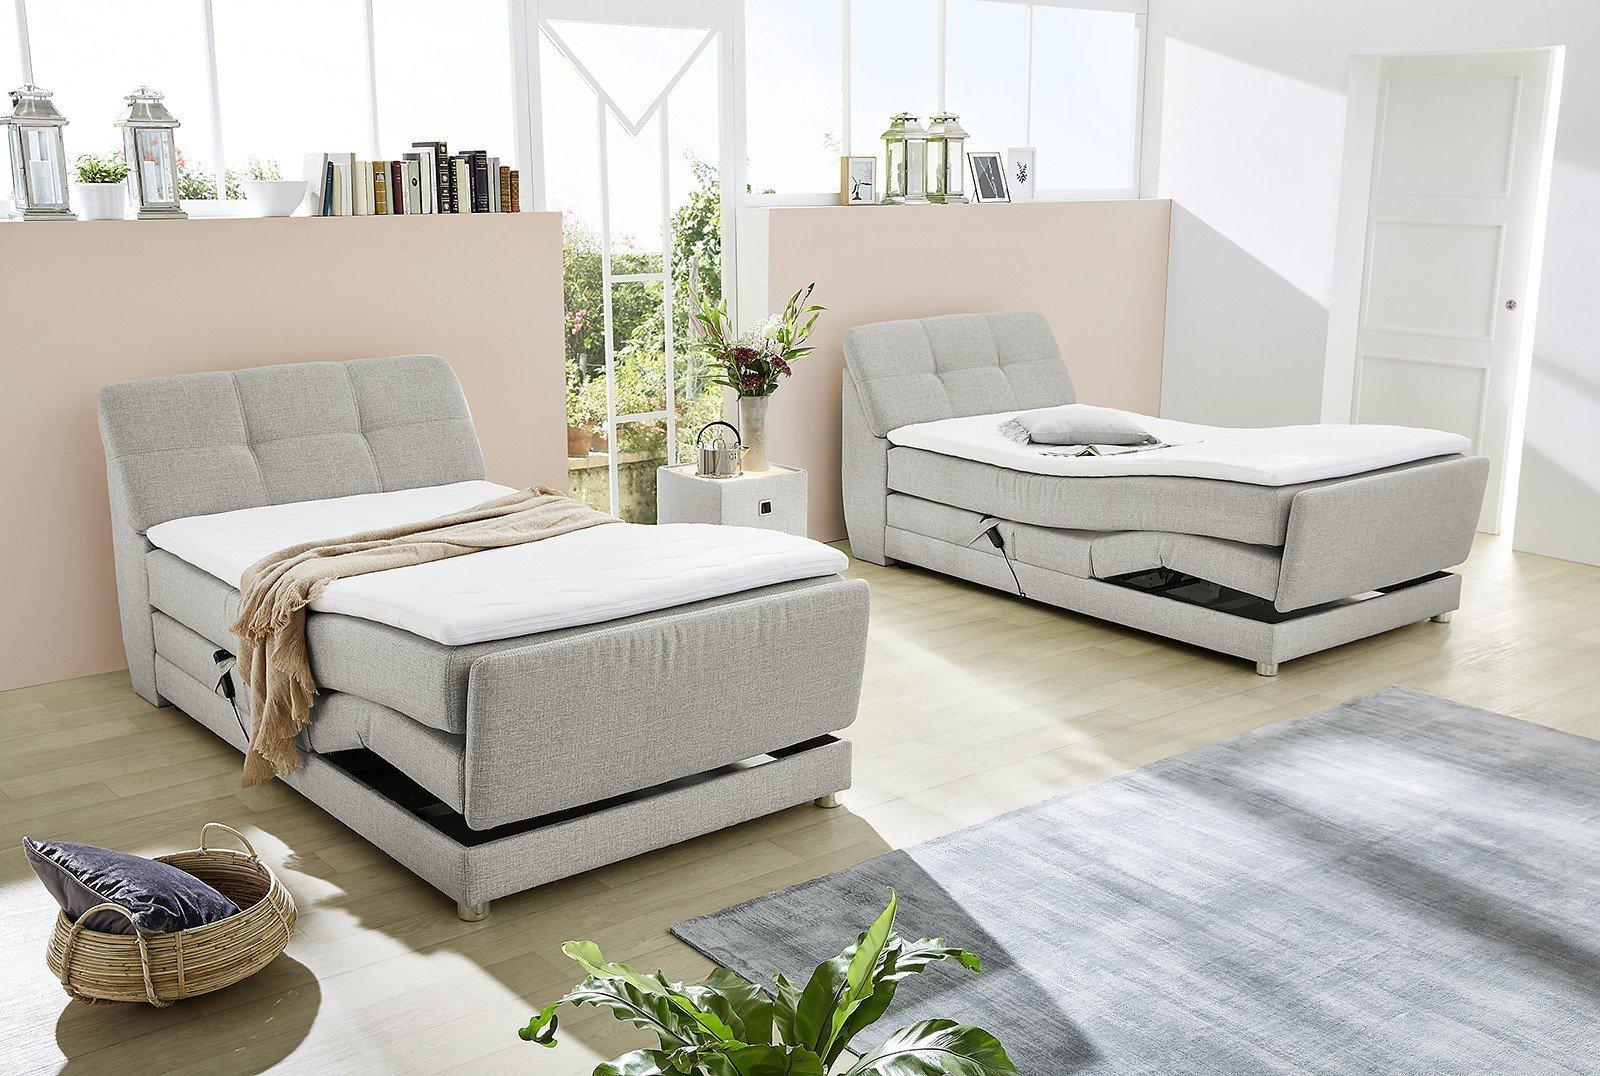 jockenh fer boxspringbett mona in zweifacher ausf hrung m bel letz ihr online shop. Black Bedroom Furniture Sets. Home Design Ideas